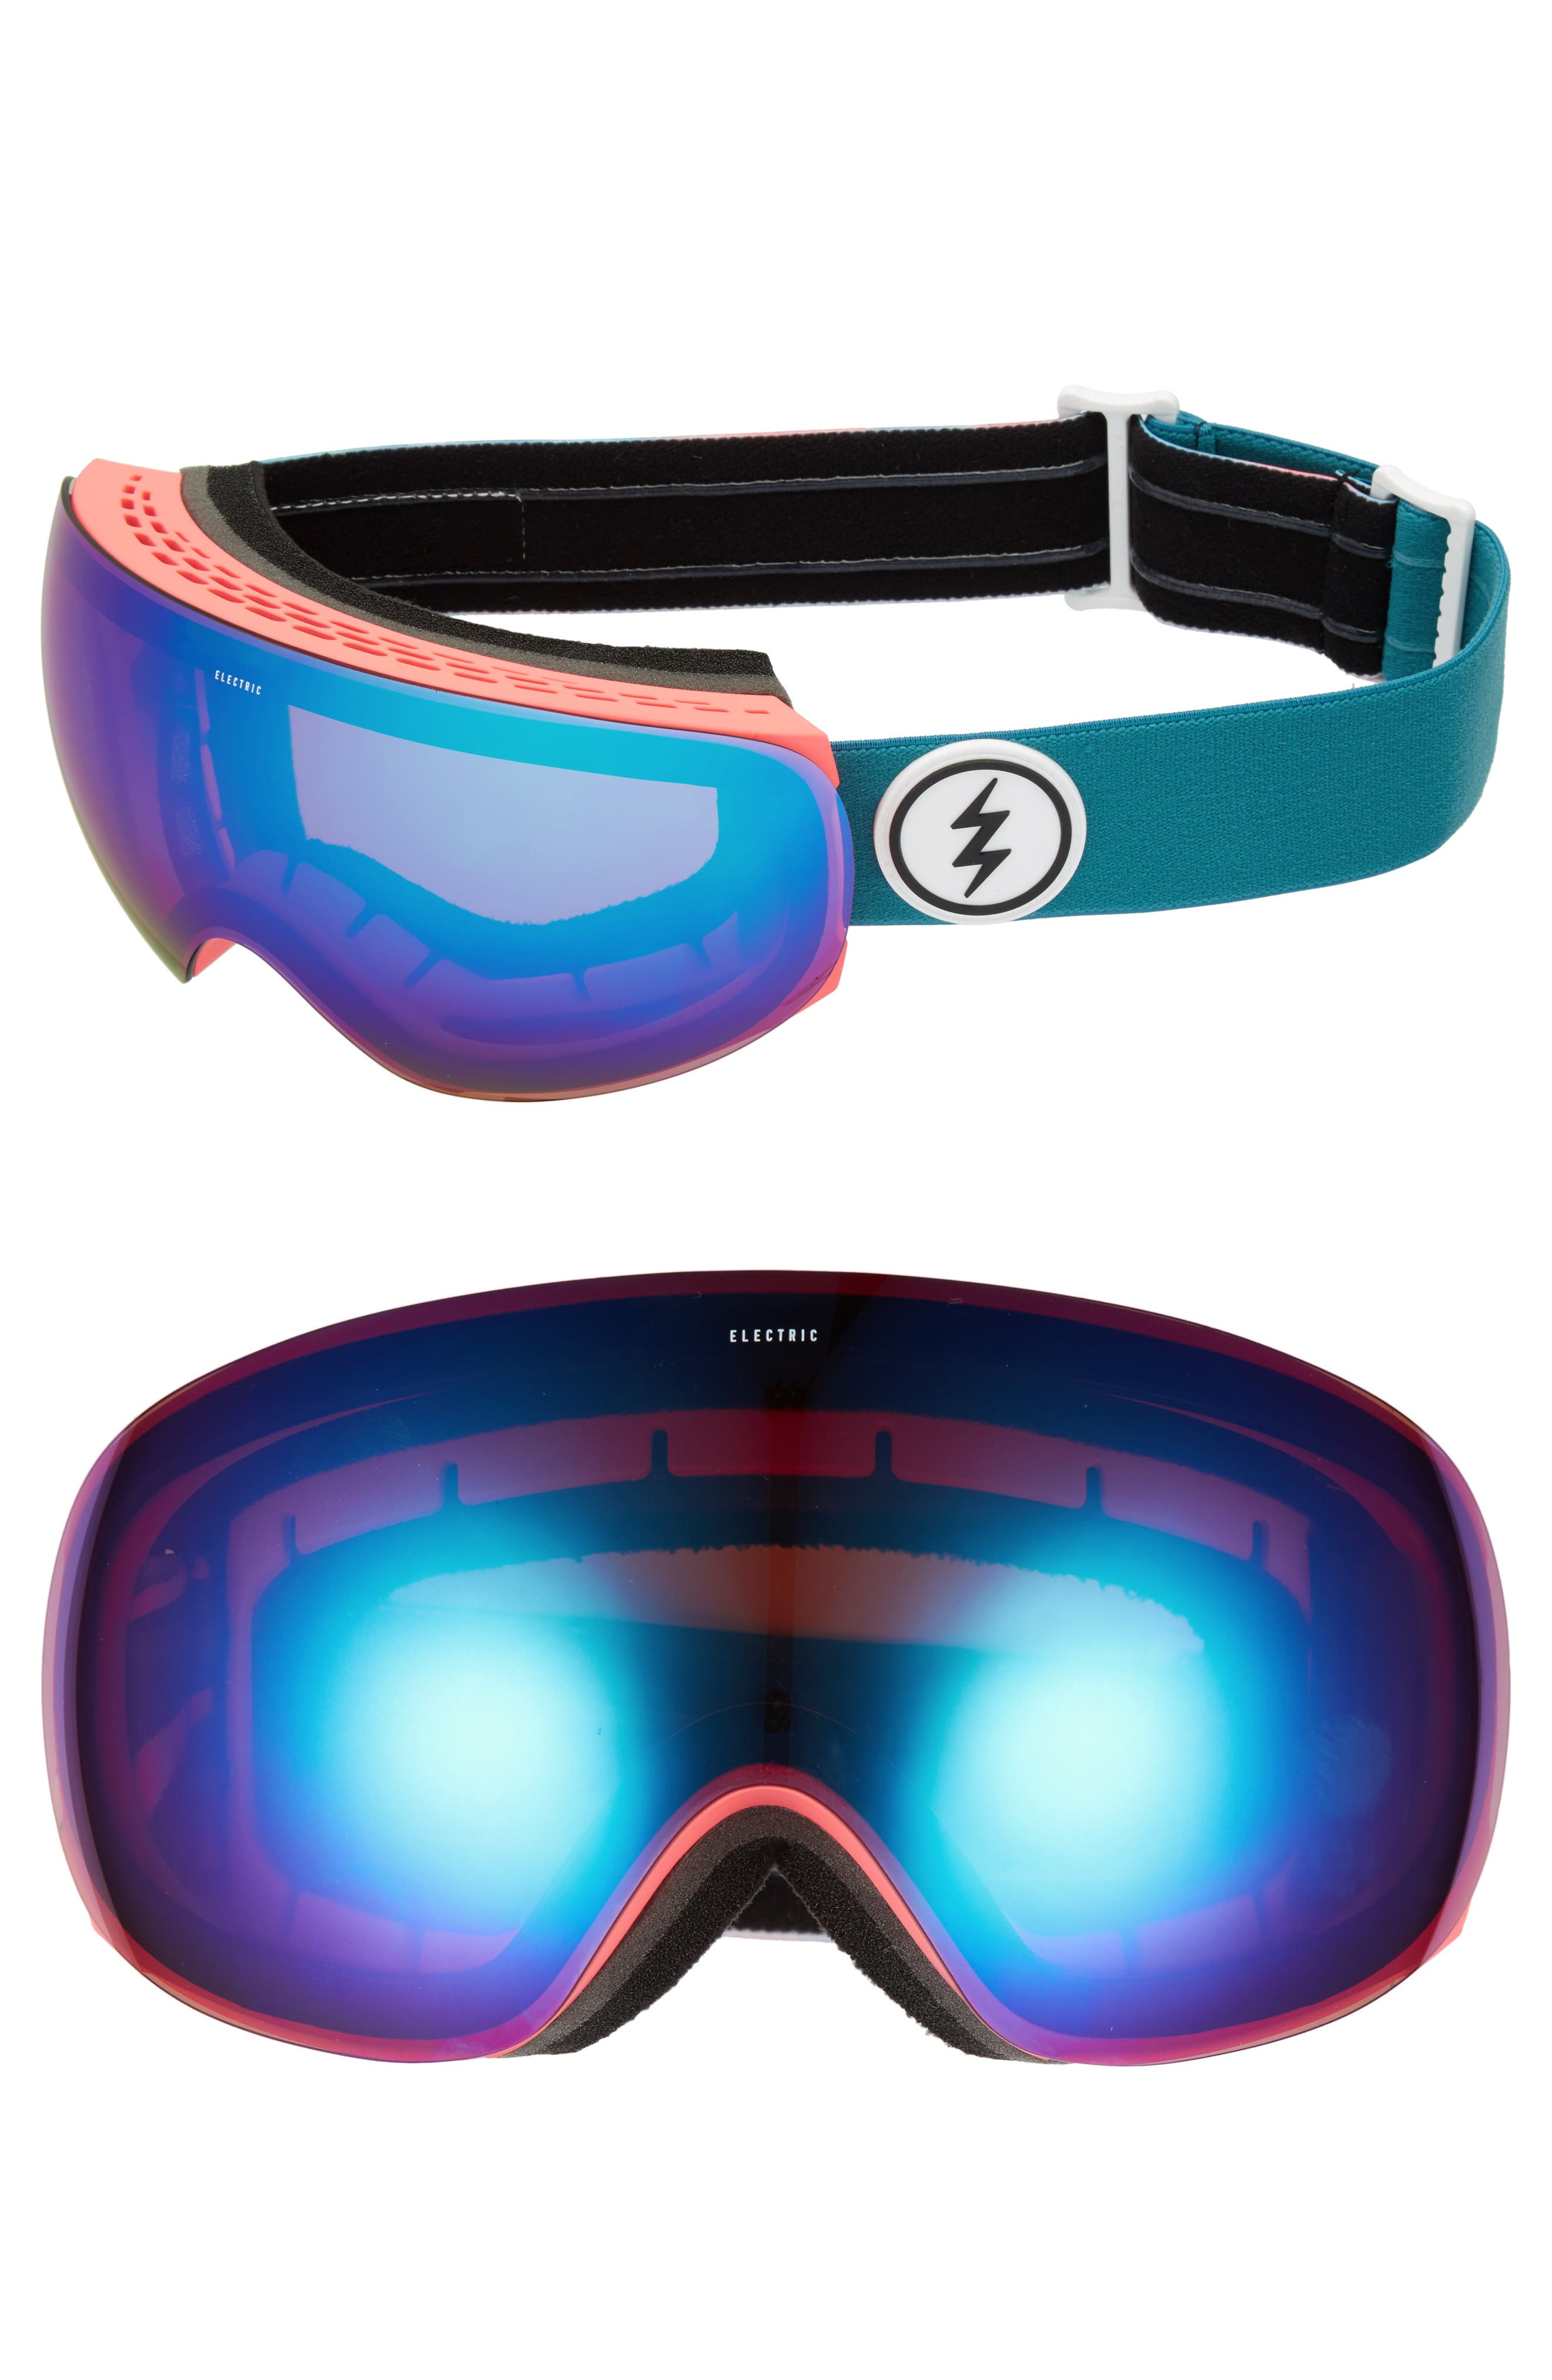 Main Image - ELECTRIC EG3.5 Snow Goggles